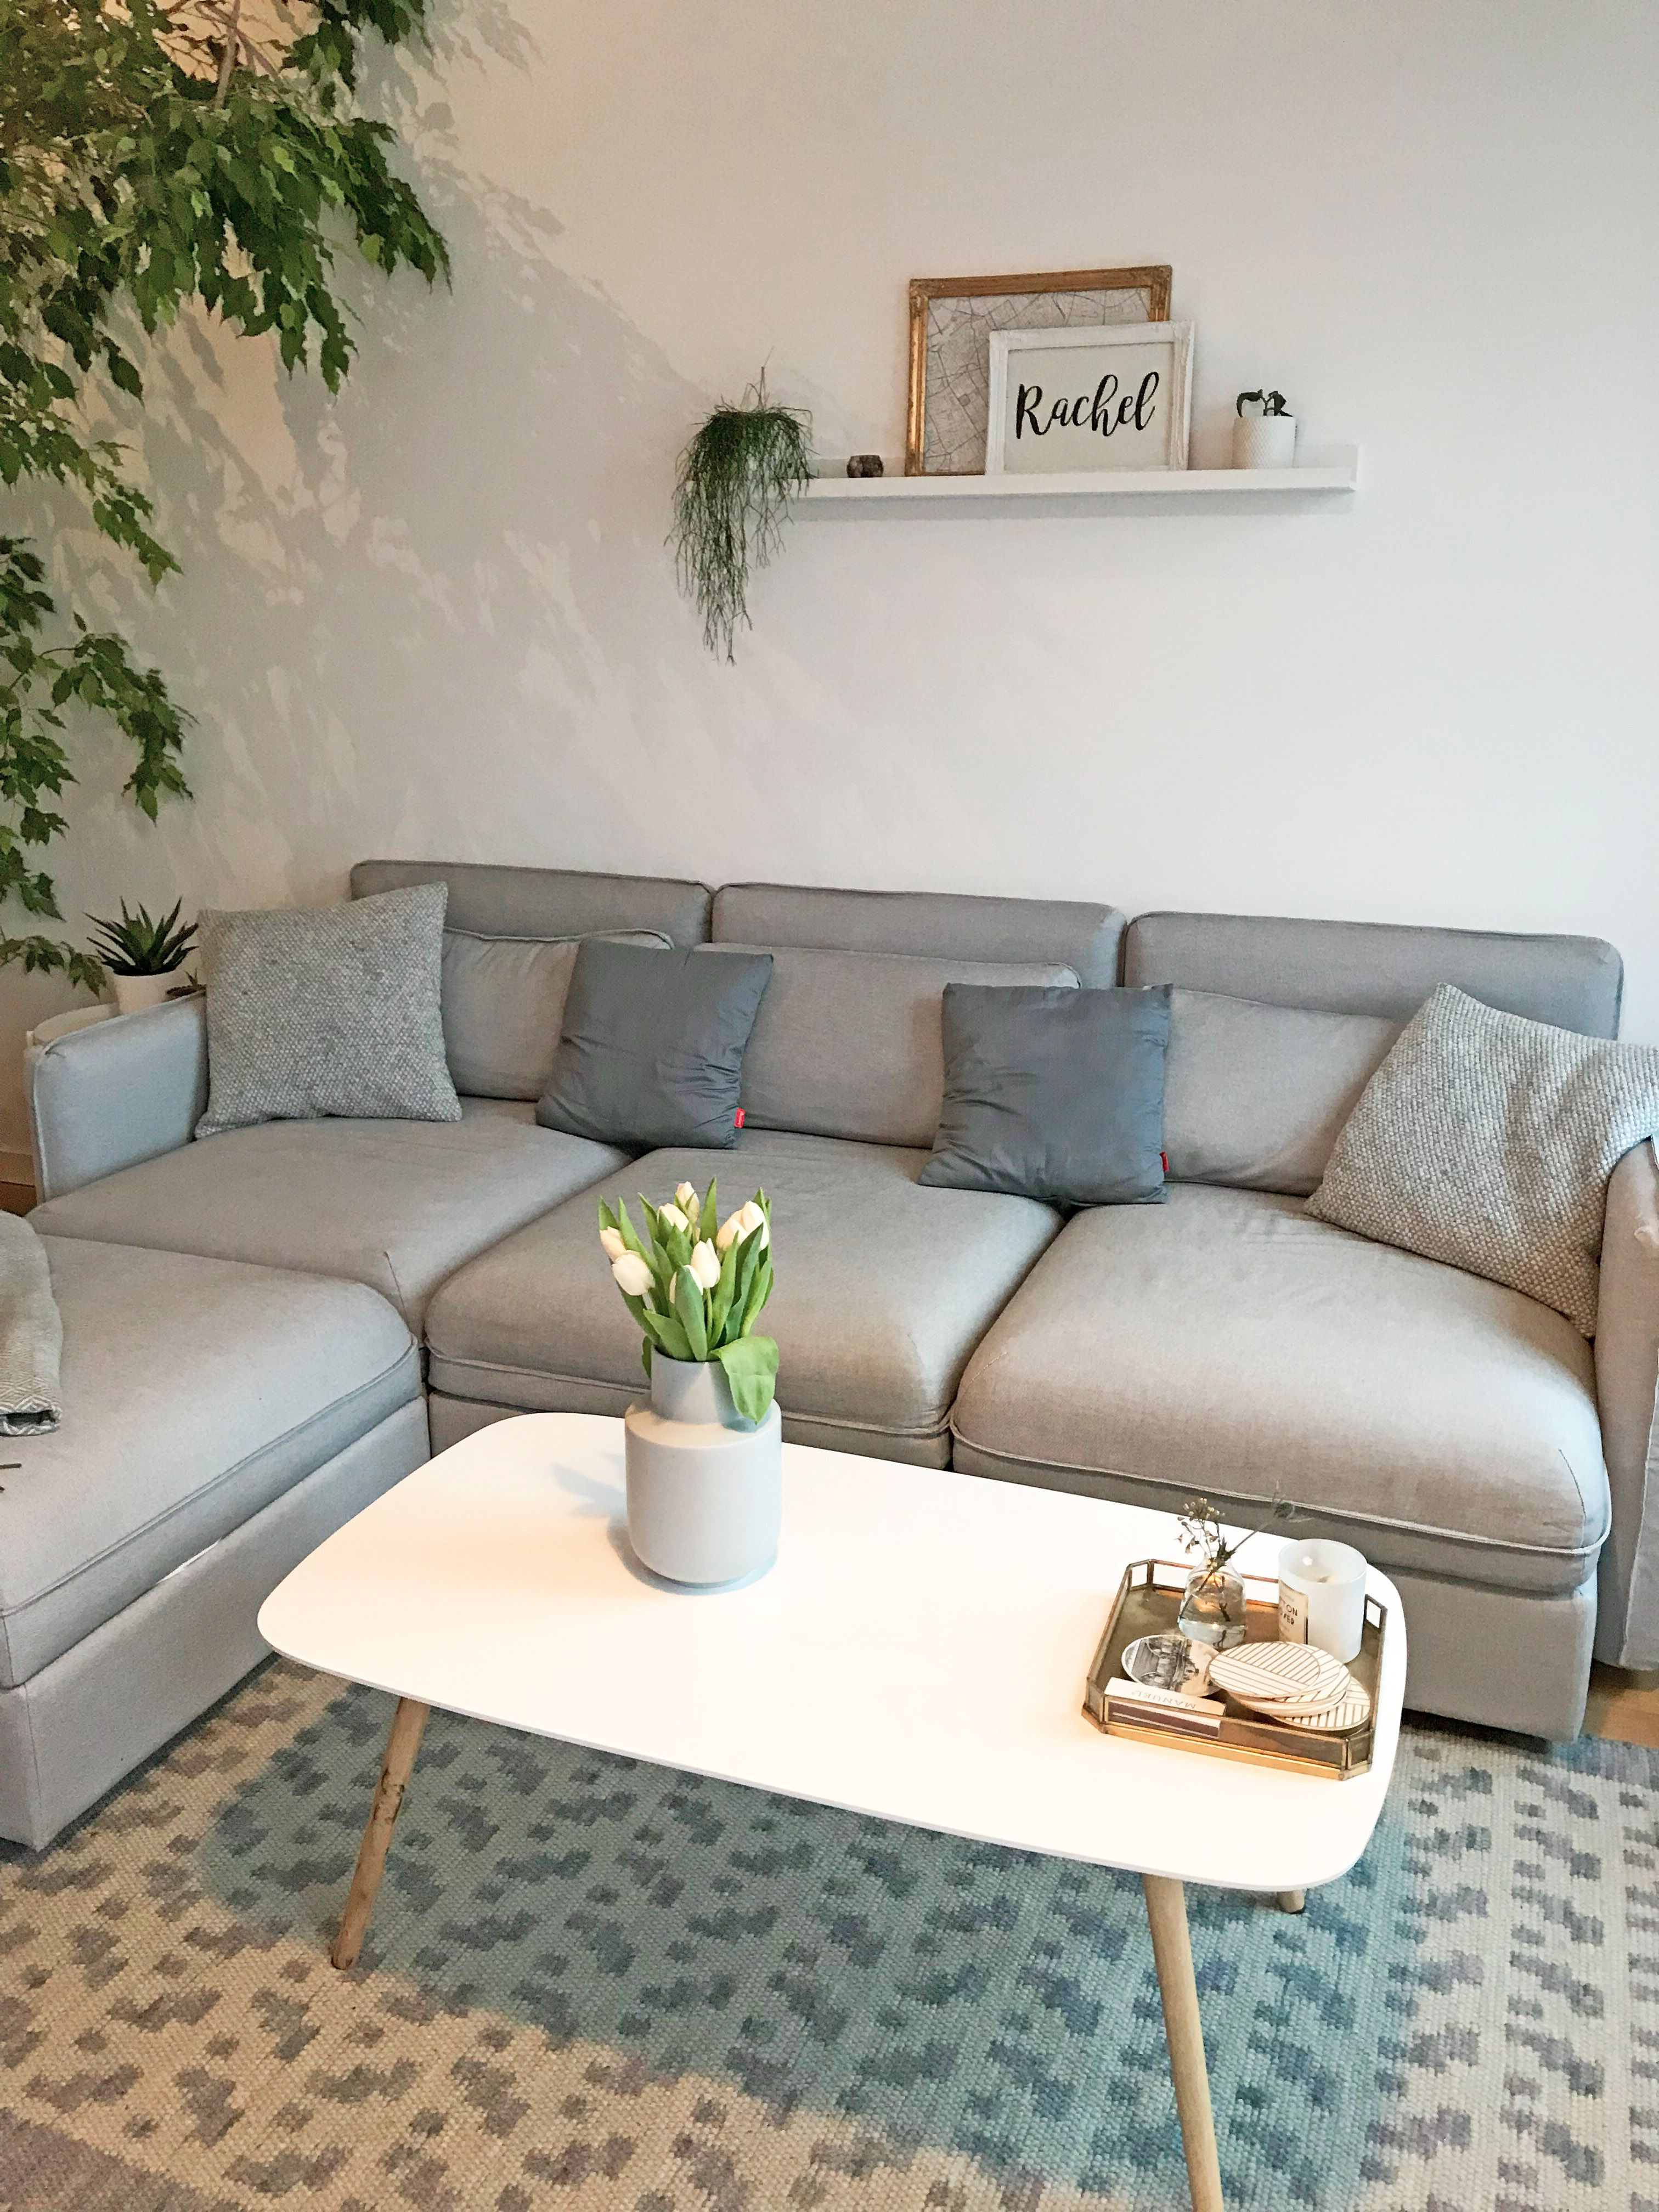 IKEA Vallentuna ikea hack Tisch vittsjö Couchtisch Beton